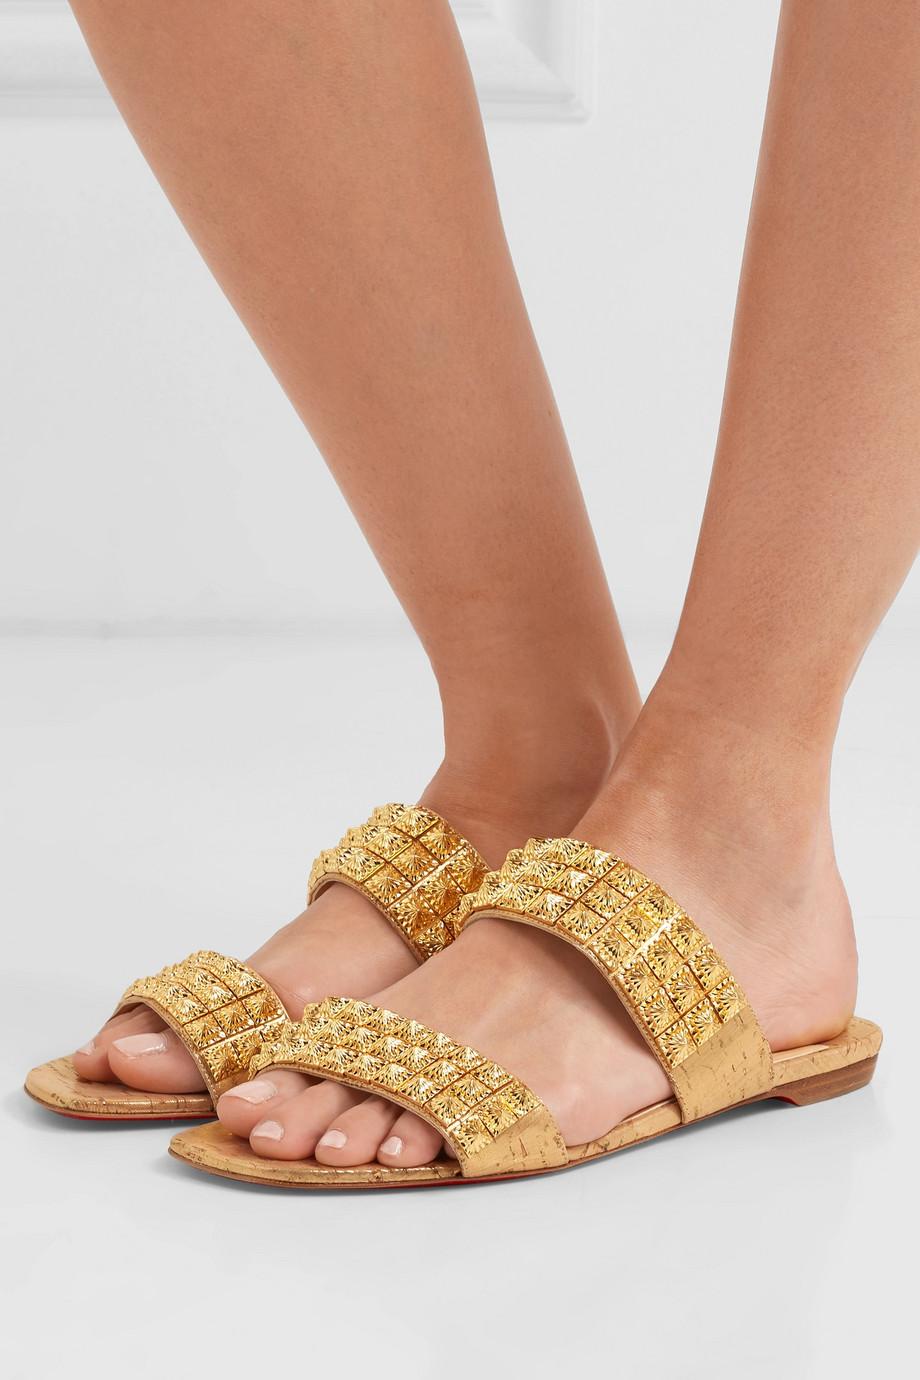 Christian Louboutin Myriadiam spiked lamé-coated cork sandals